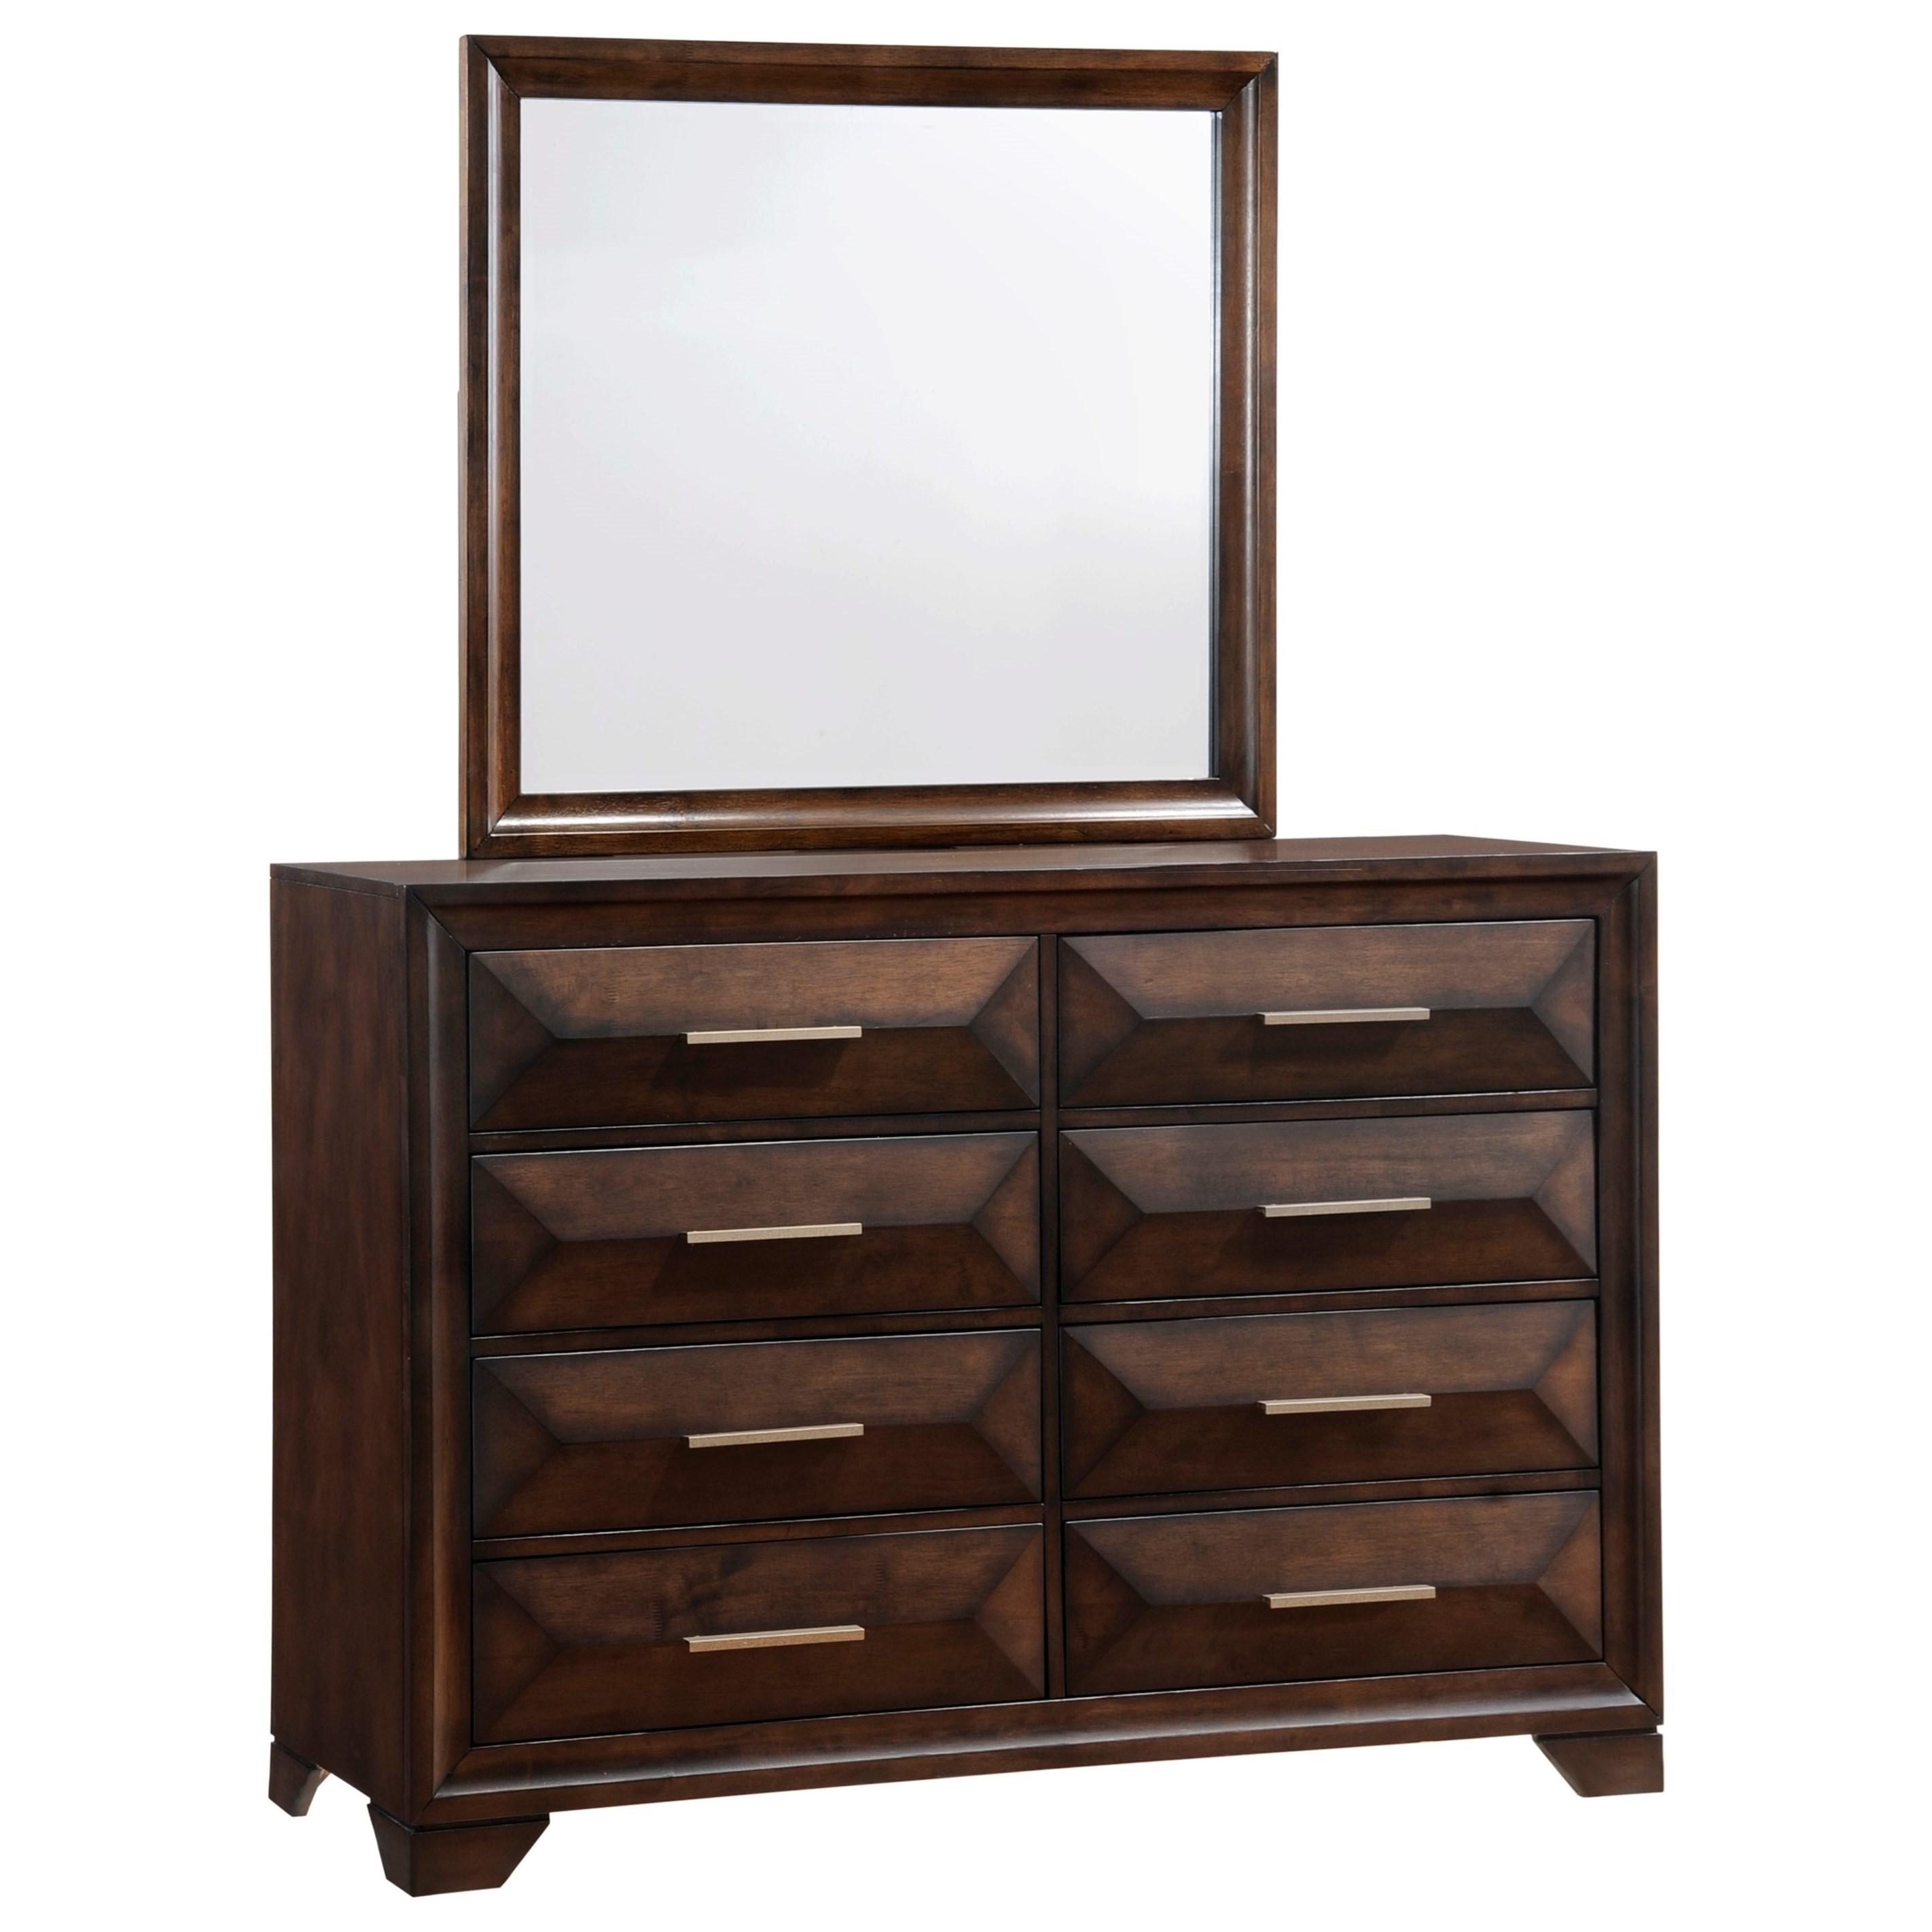 Anthem Dresser and Mirror Set by Lane at Story & Lee Furniture